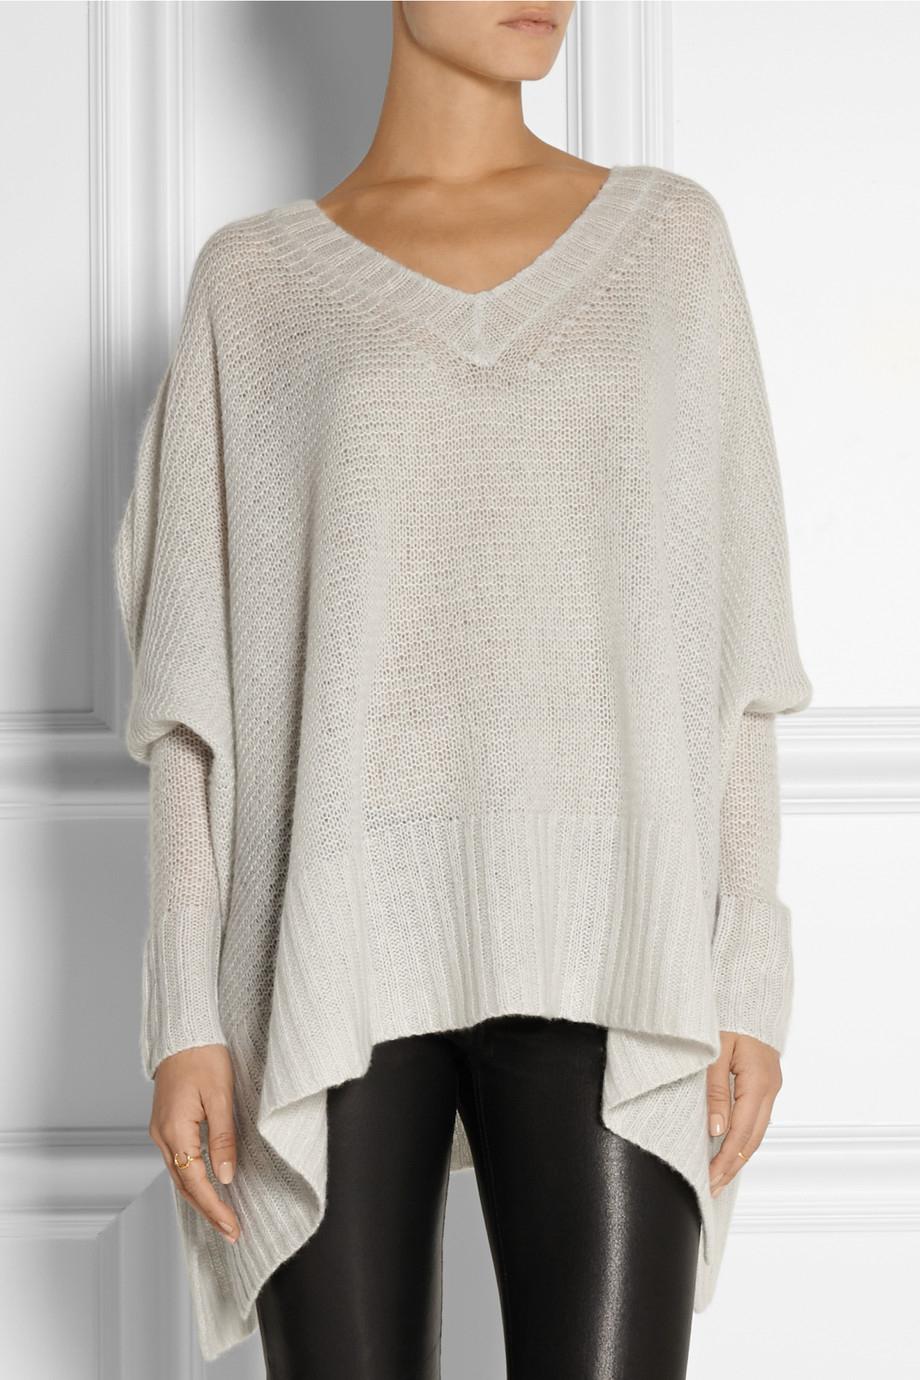 lyst donna karan draped cashmere and silk blend sweater. Black Bedroom Furniture Sets. Home Design Ideas